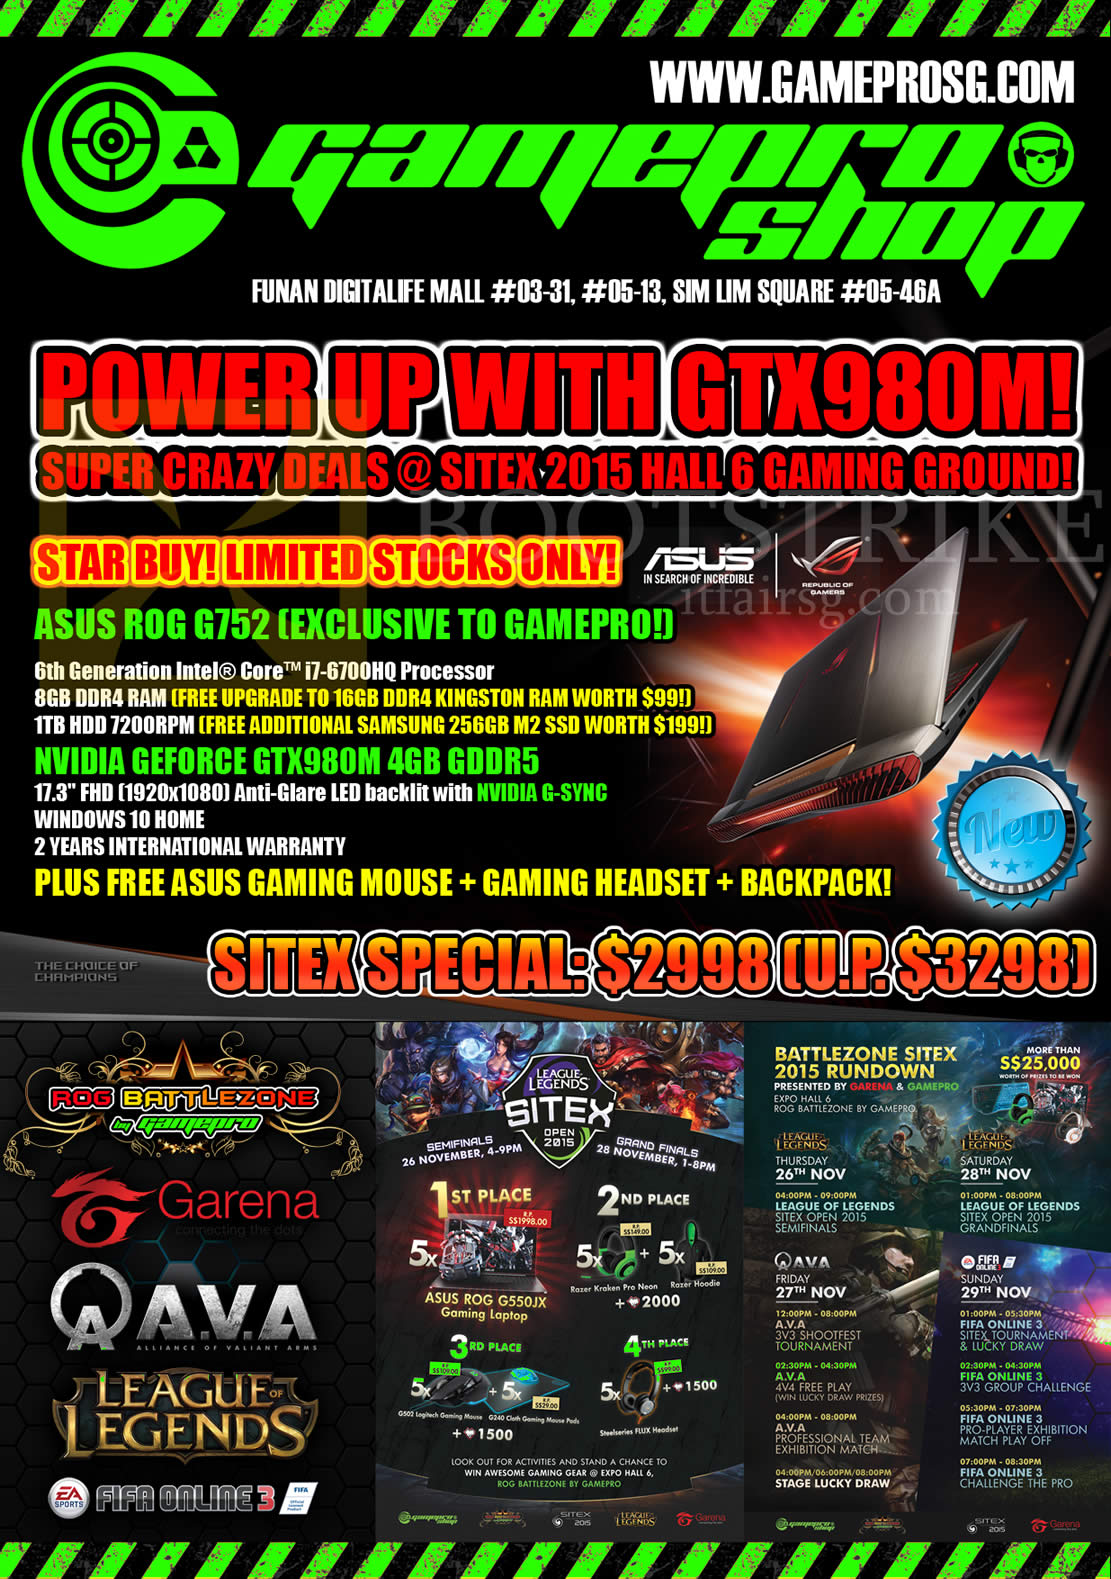 SITEX 2015 price list image brochure of Gamepro Notebooks Asus ROG G752, Nvidia Geforce GTX980M